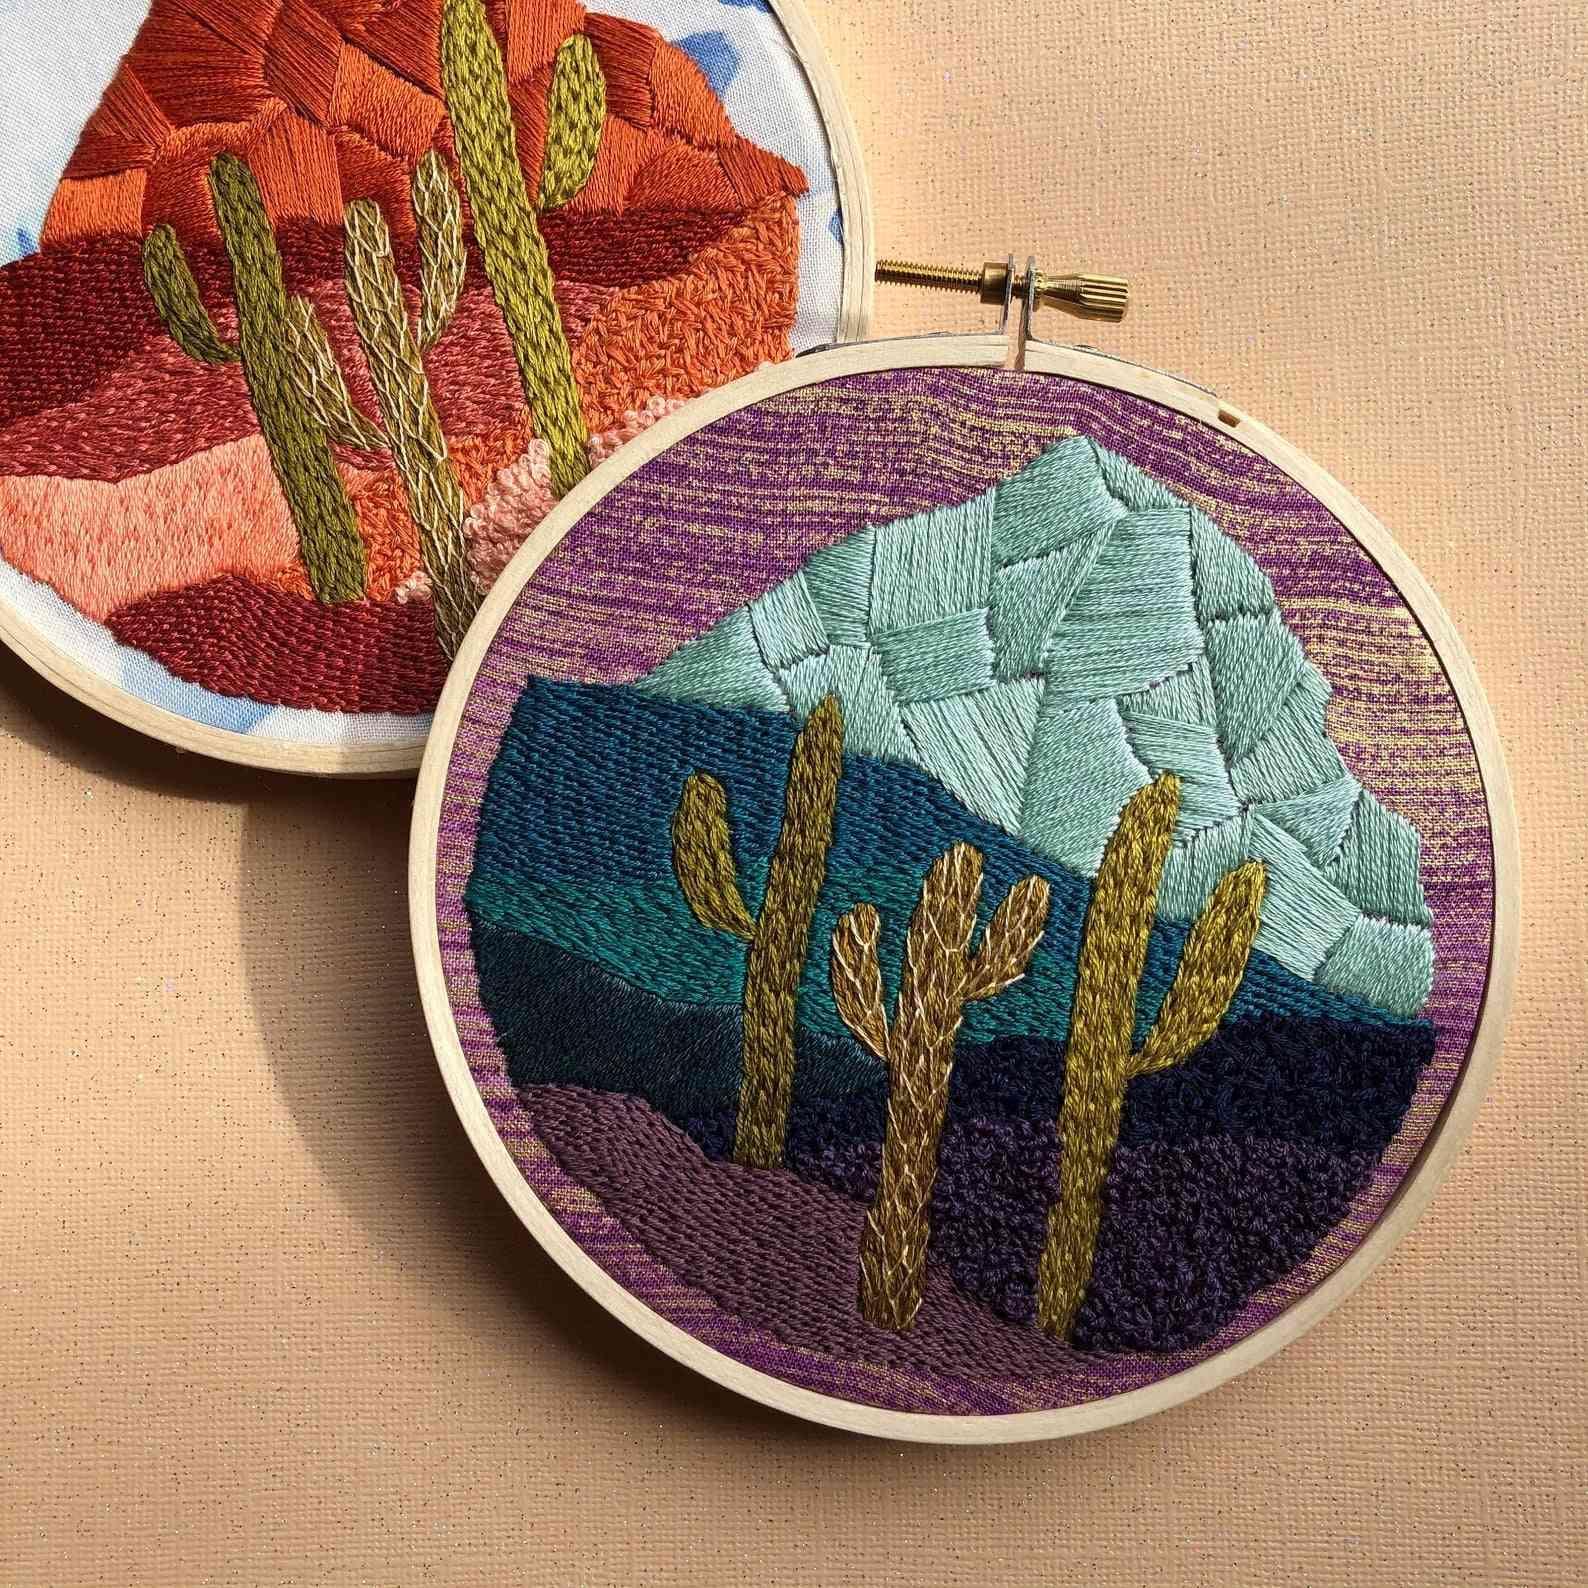 Cactus Desert At Night Landscape- Diy Beginner Embroidery Kit